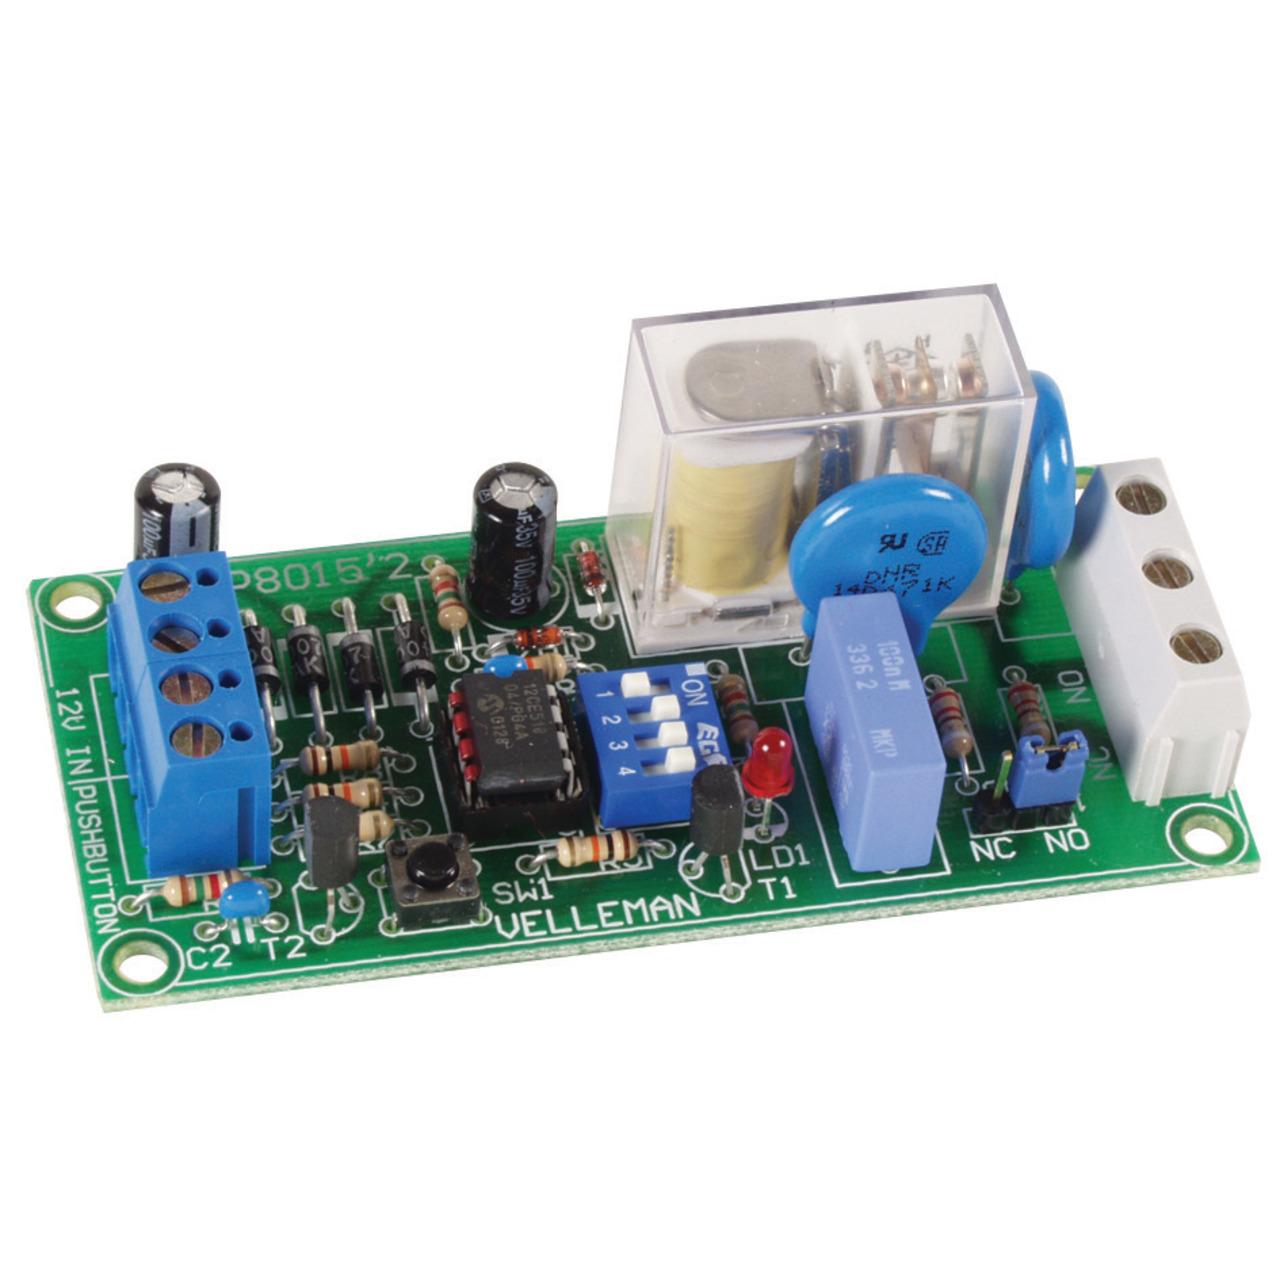 Velleman Bausatz Multifunktionales Relaismodul K8015